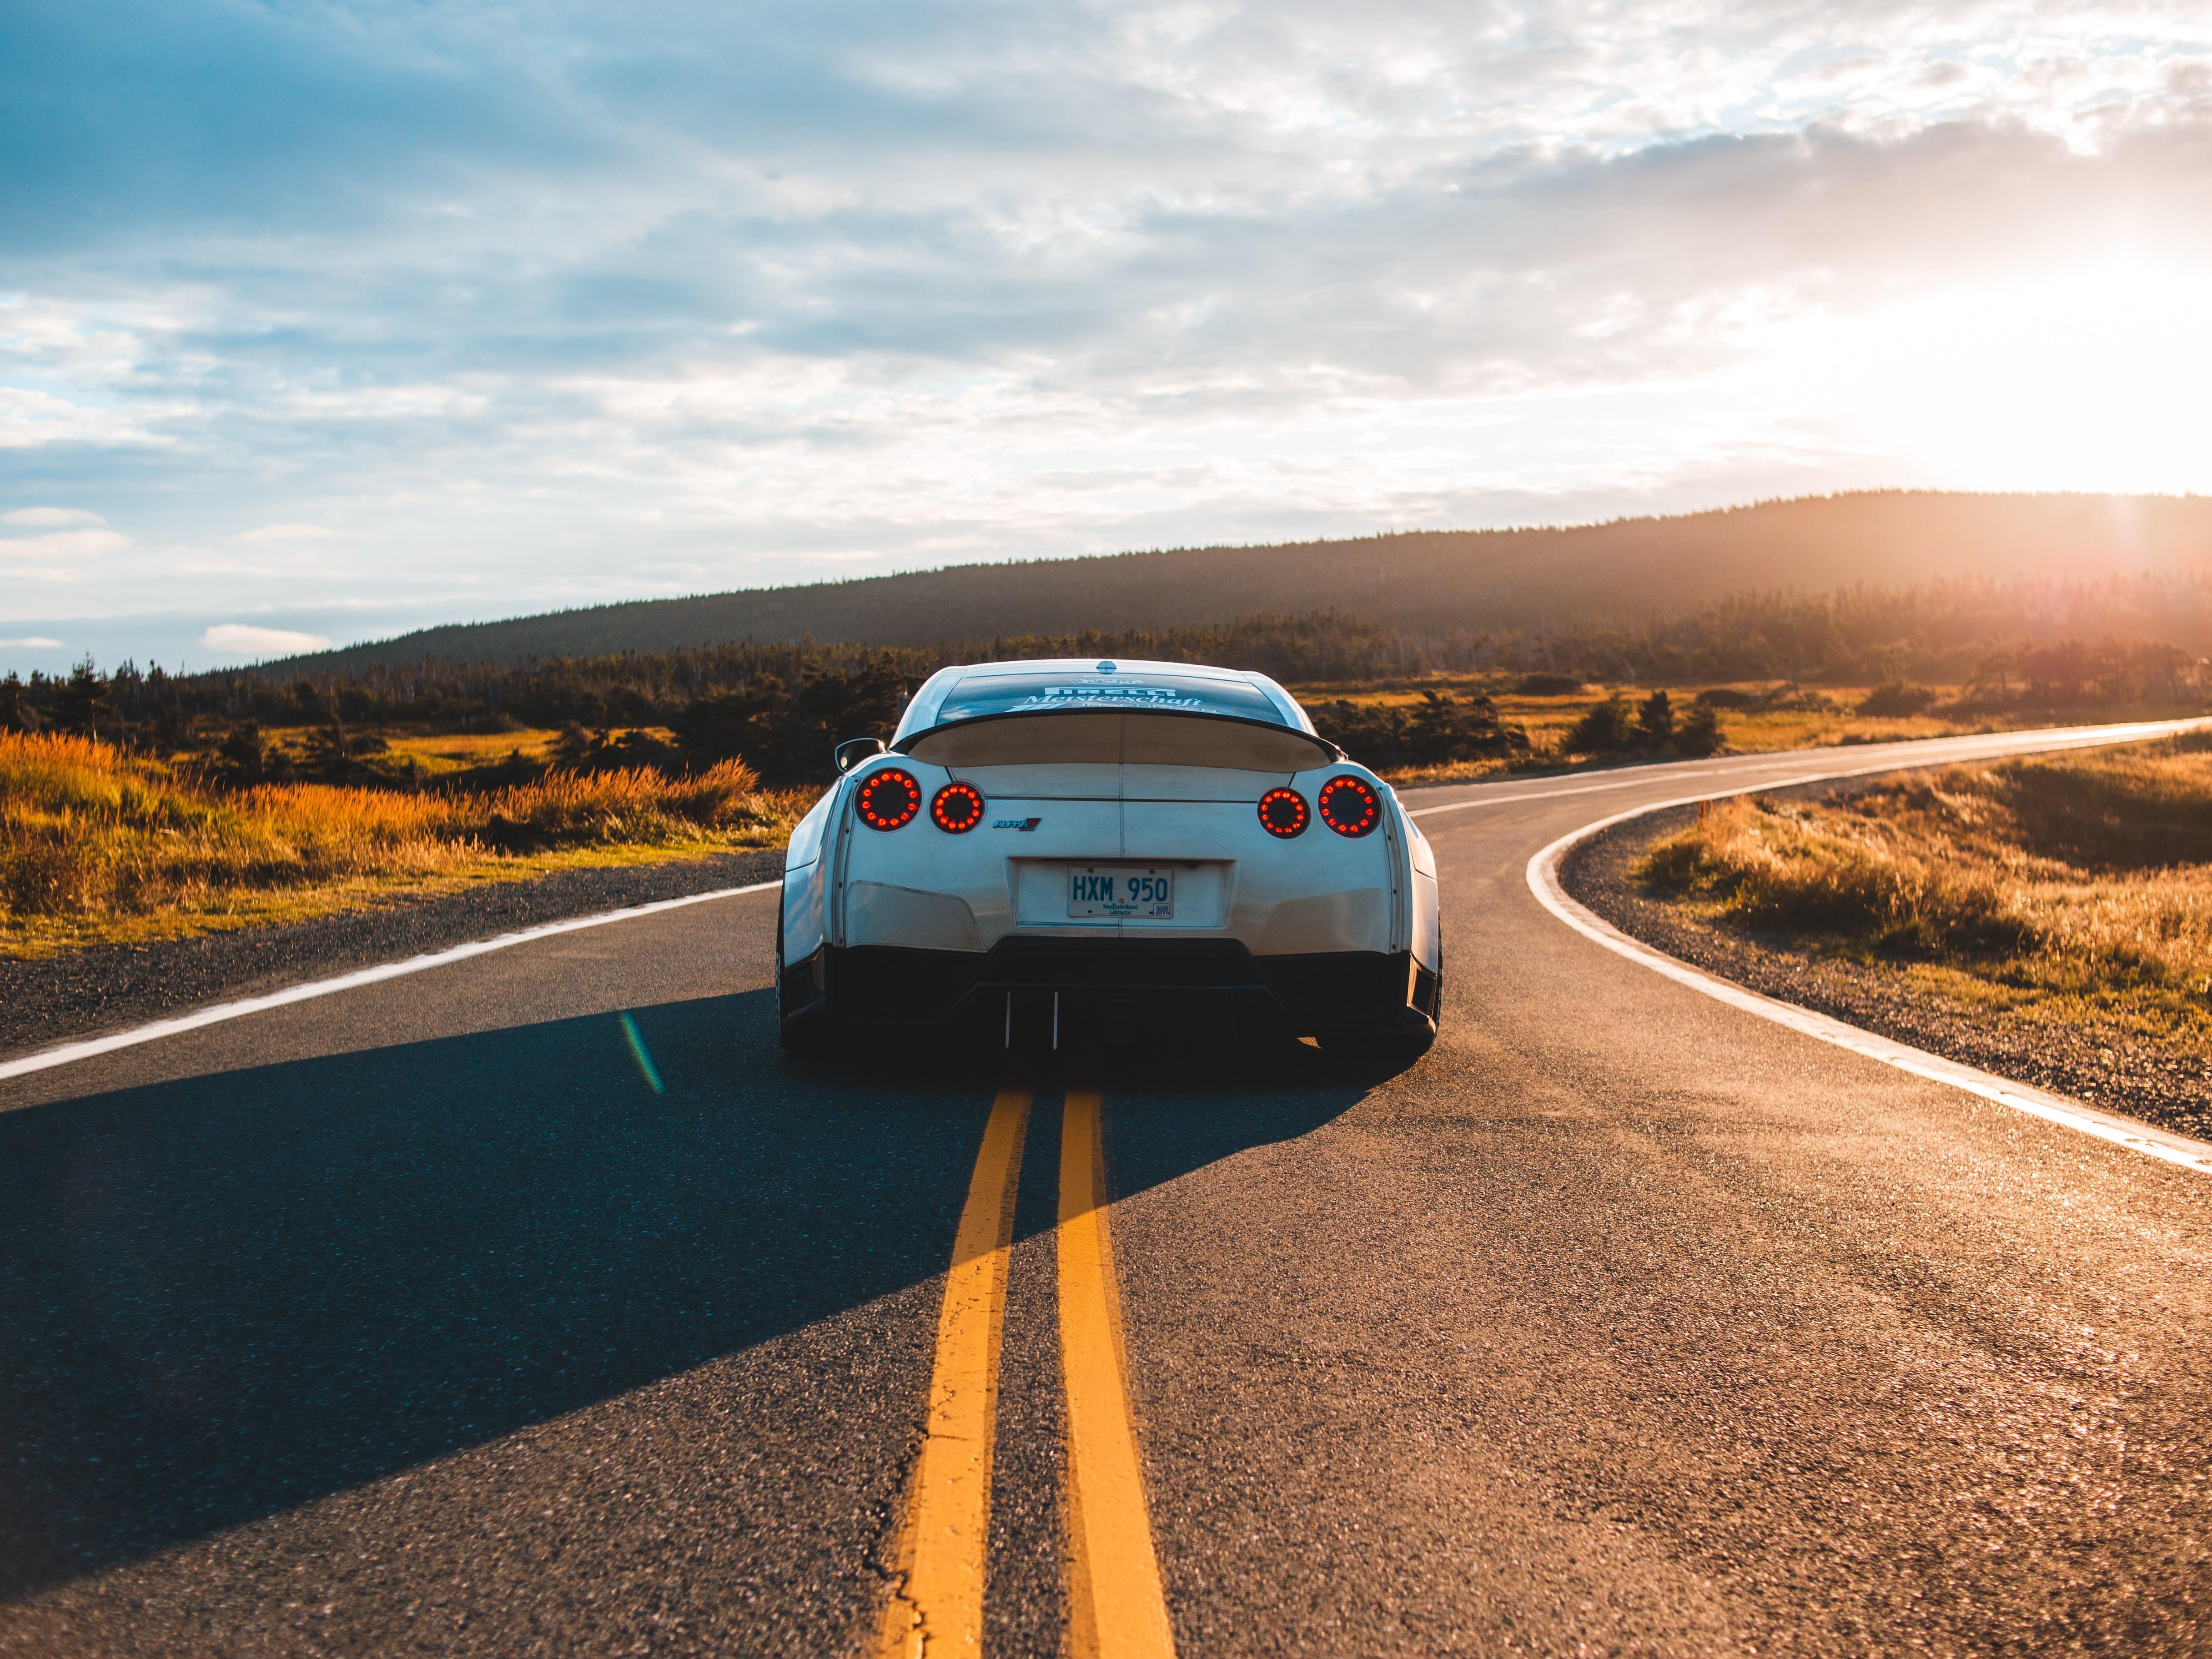 A car on the road. Image credit:  Erik Mclean/Unsplash